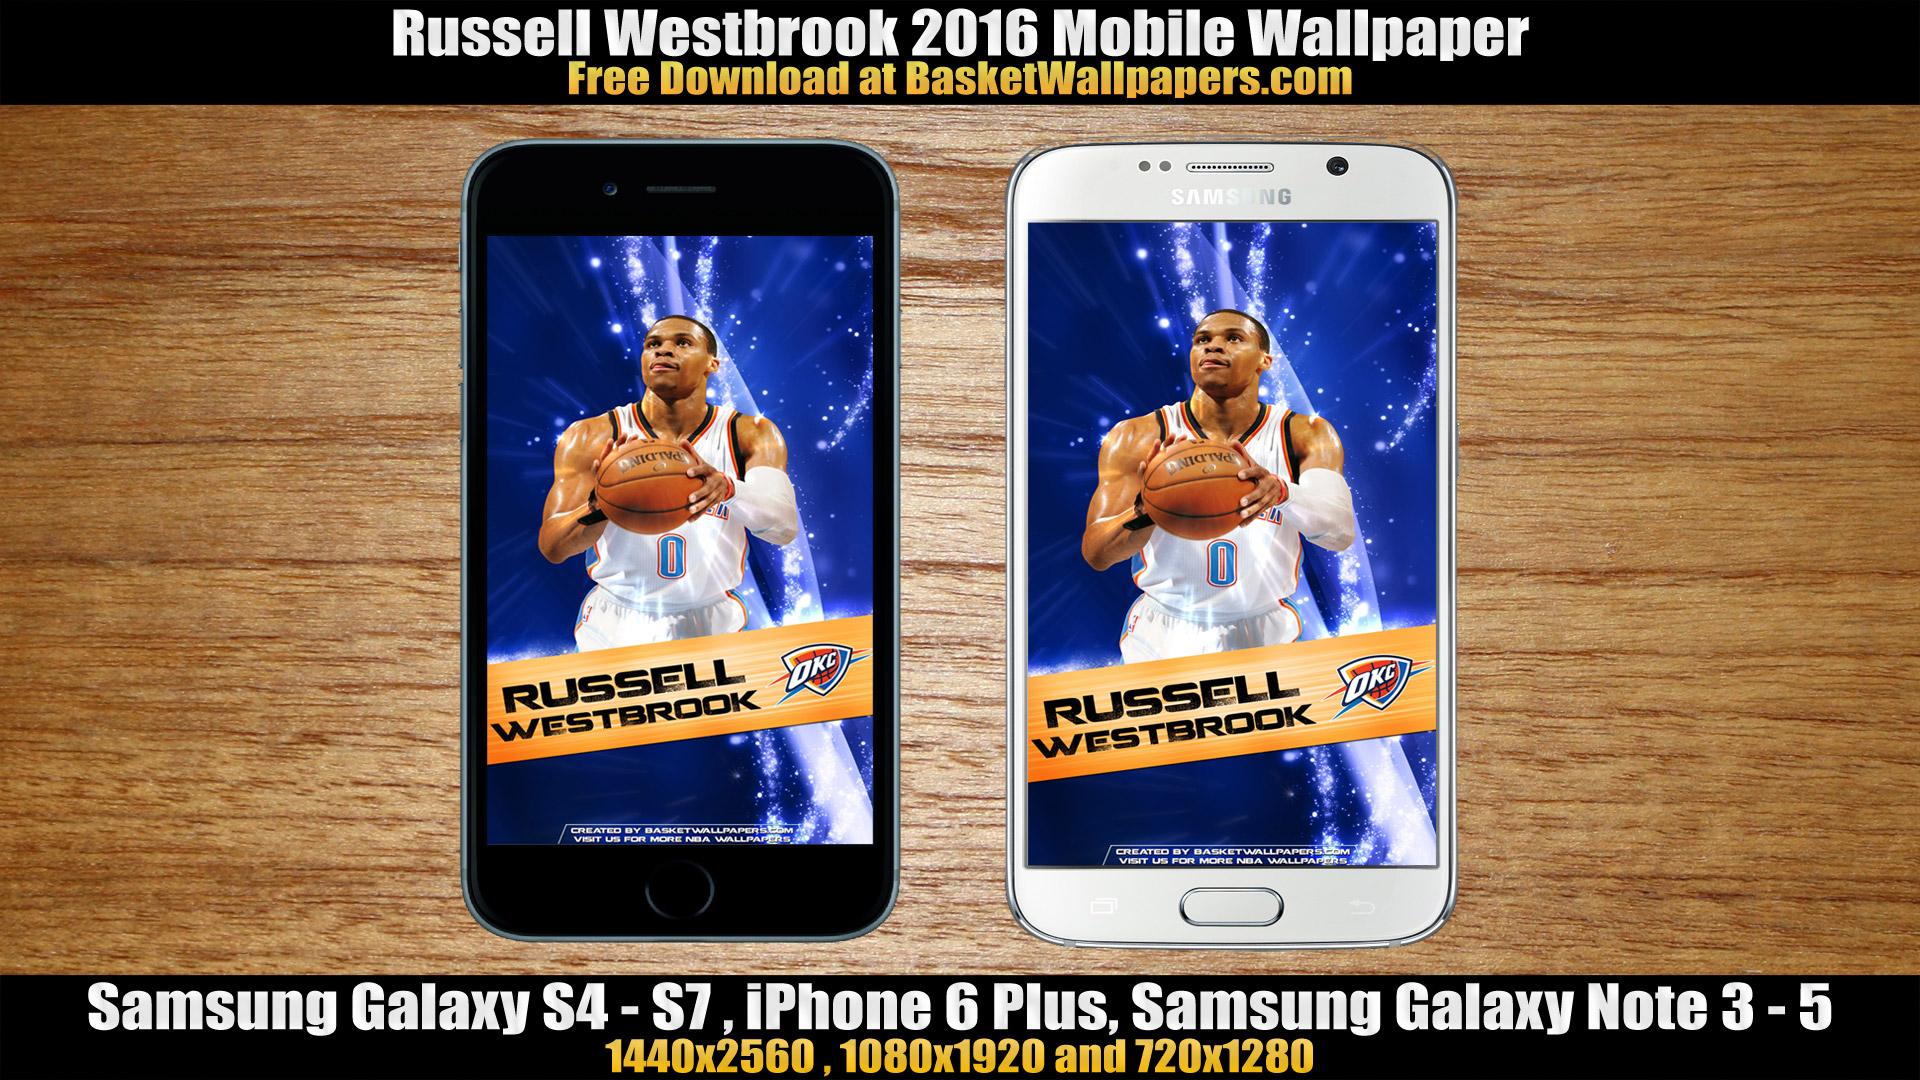 Russell Westbrook OKC Thunder 2016 Mobile Wallpaper